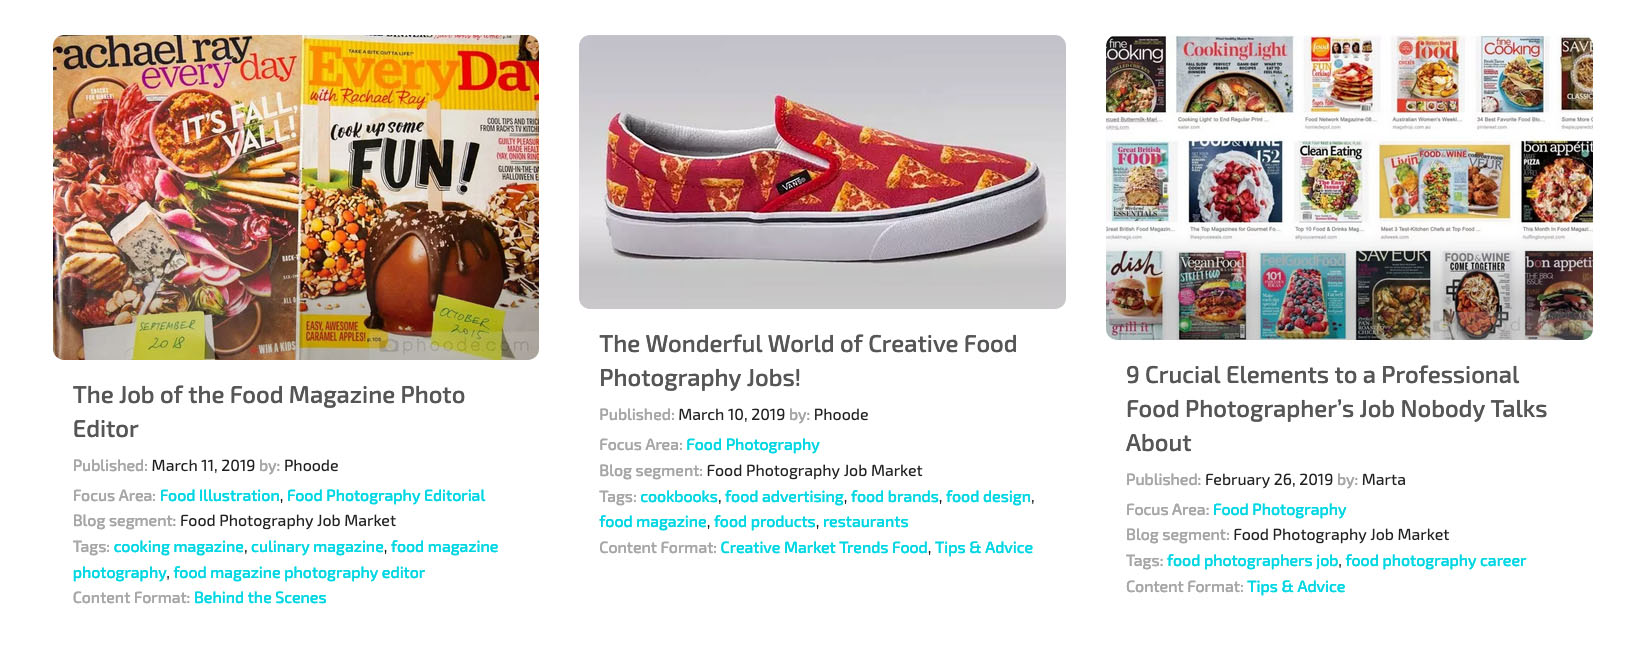 professional food photography blog, phoode food photography blog segments; professional food photography blog; international food photography community; food photography job market